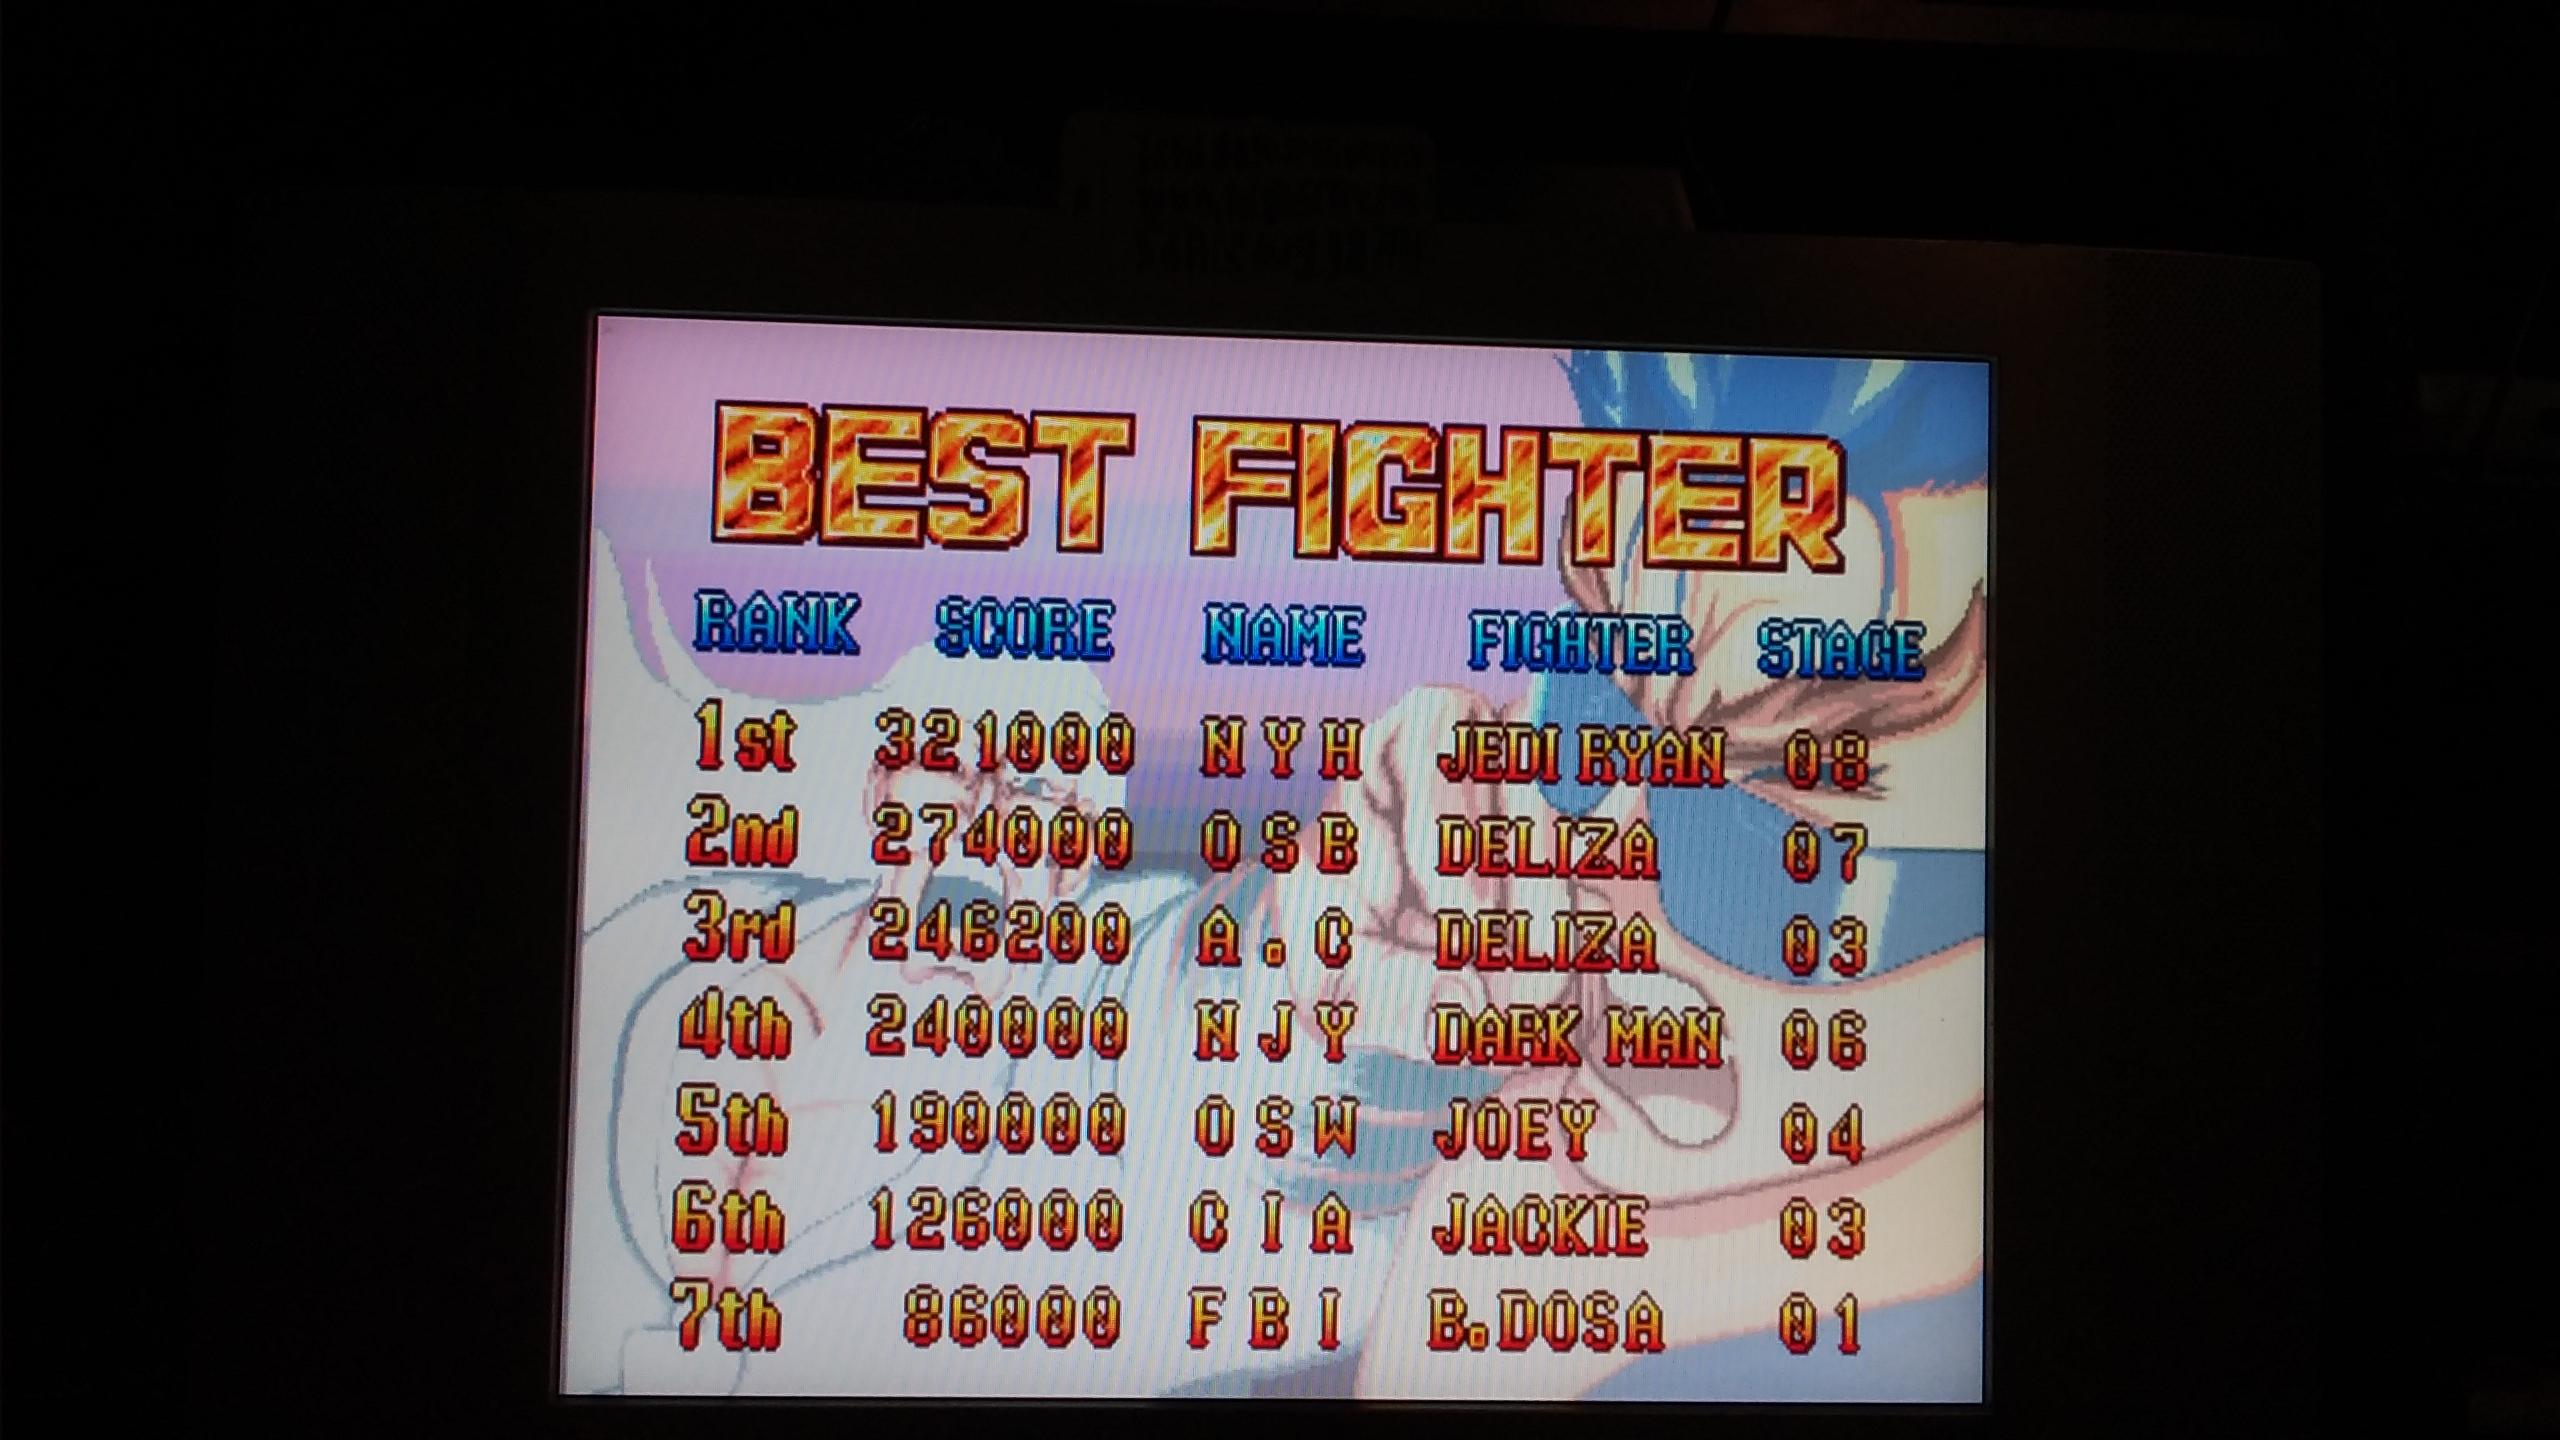 Dragon Master 246,200 points